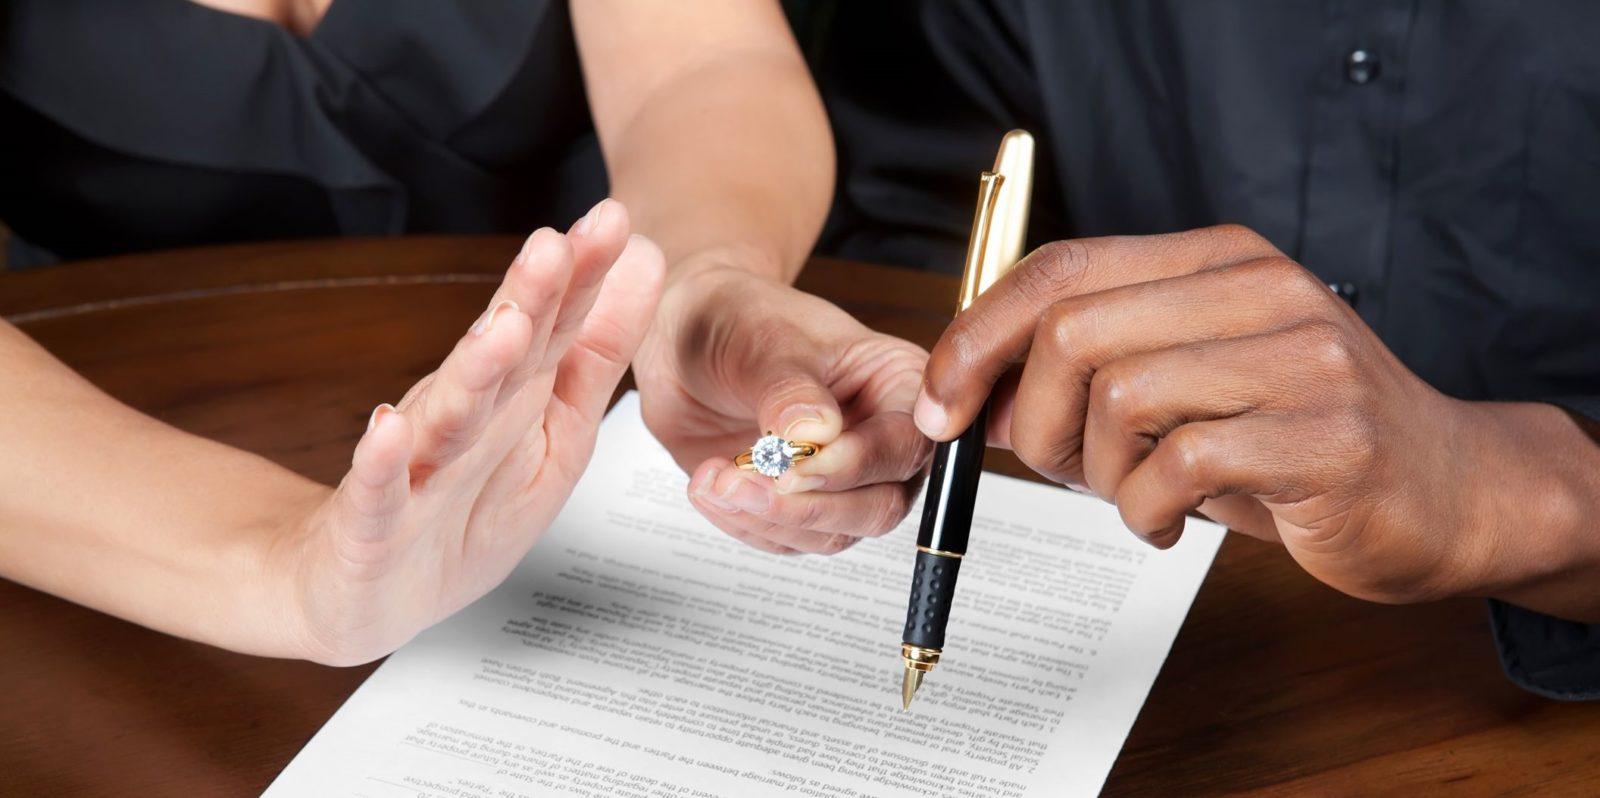 Сколько стоит госпошлина на развод